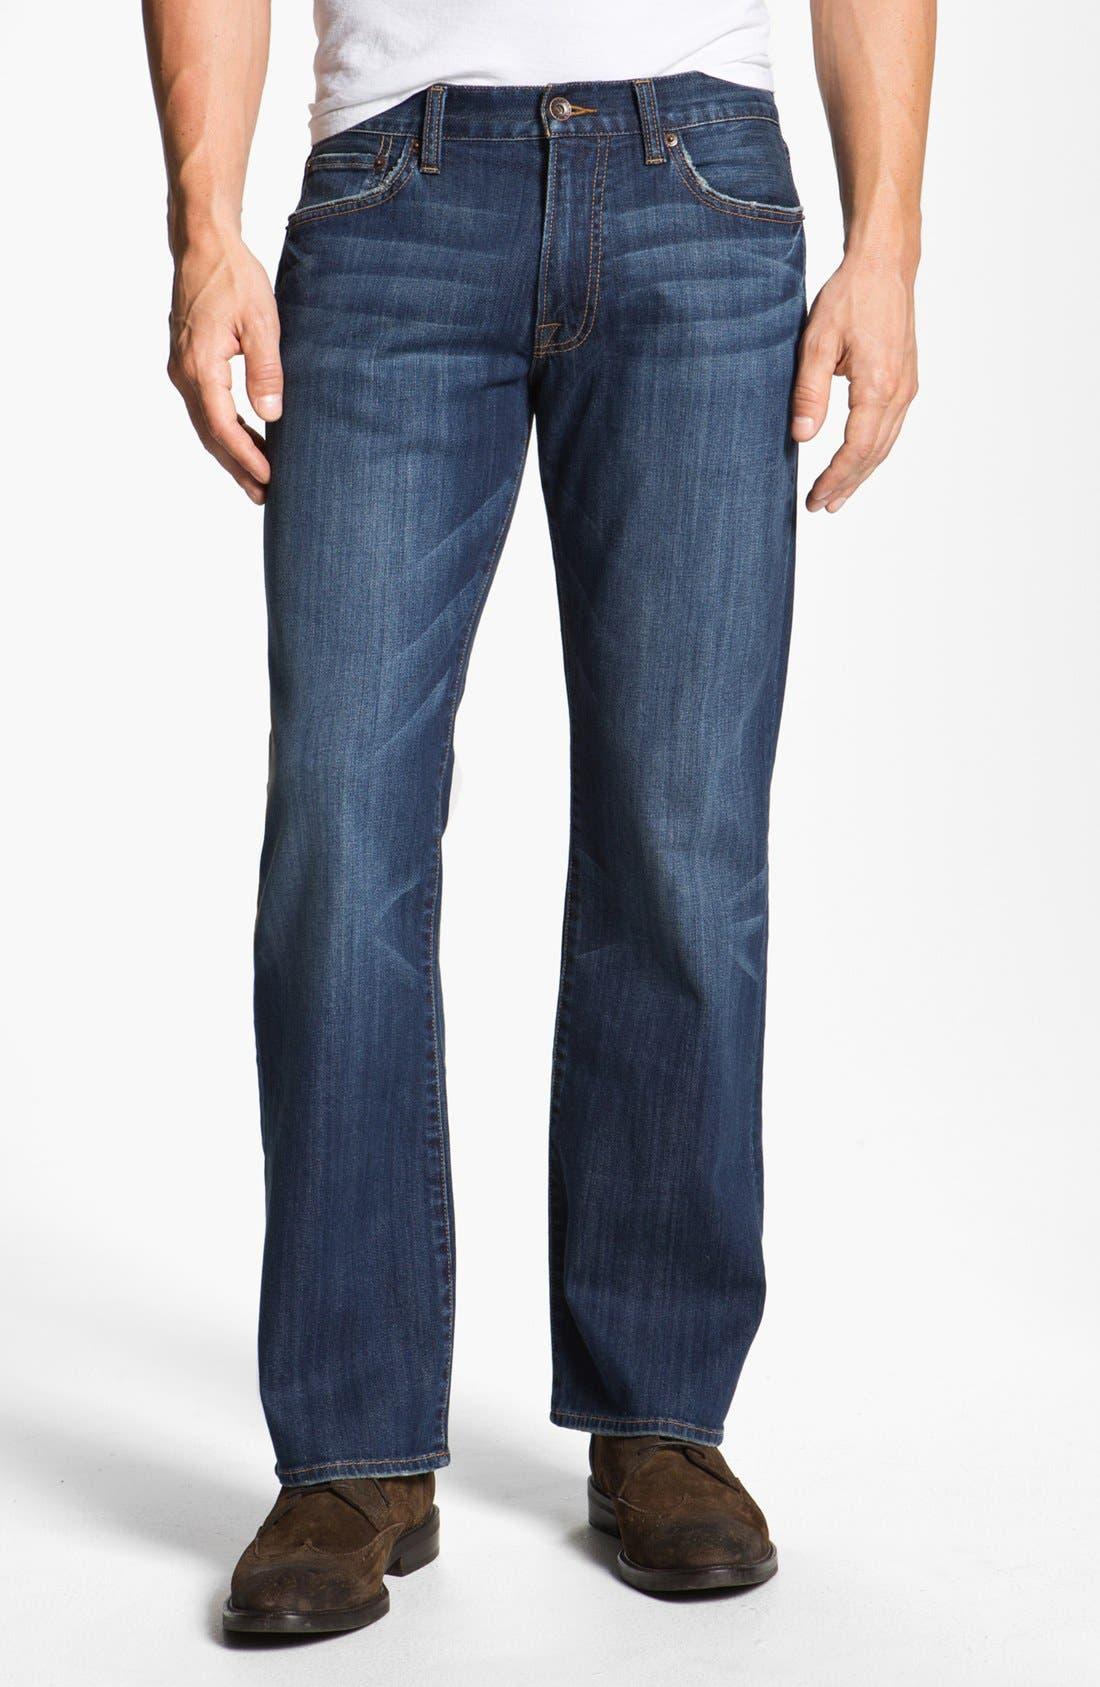 Main Image - Lucky Brand '361 Vintage' Straight leg Jeans (Erwin)